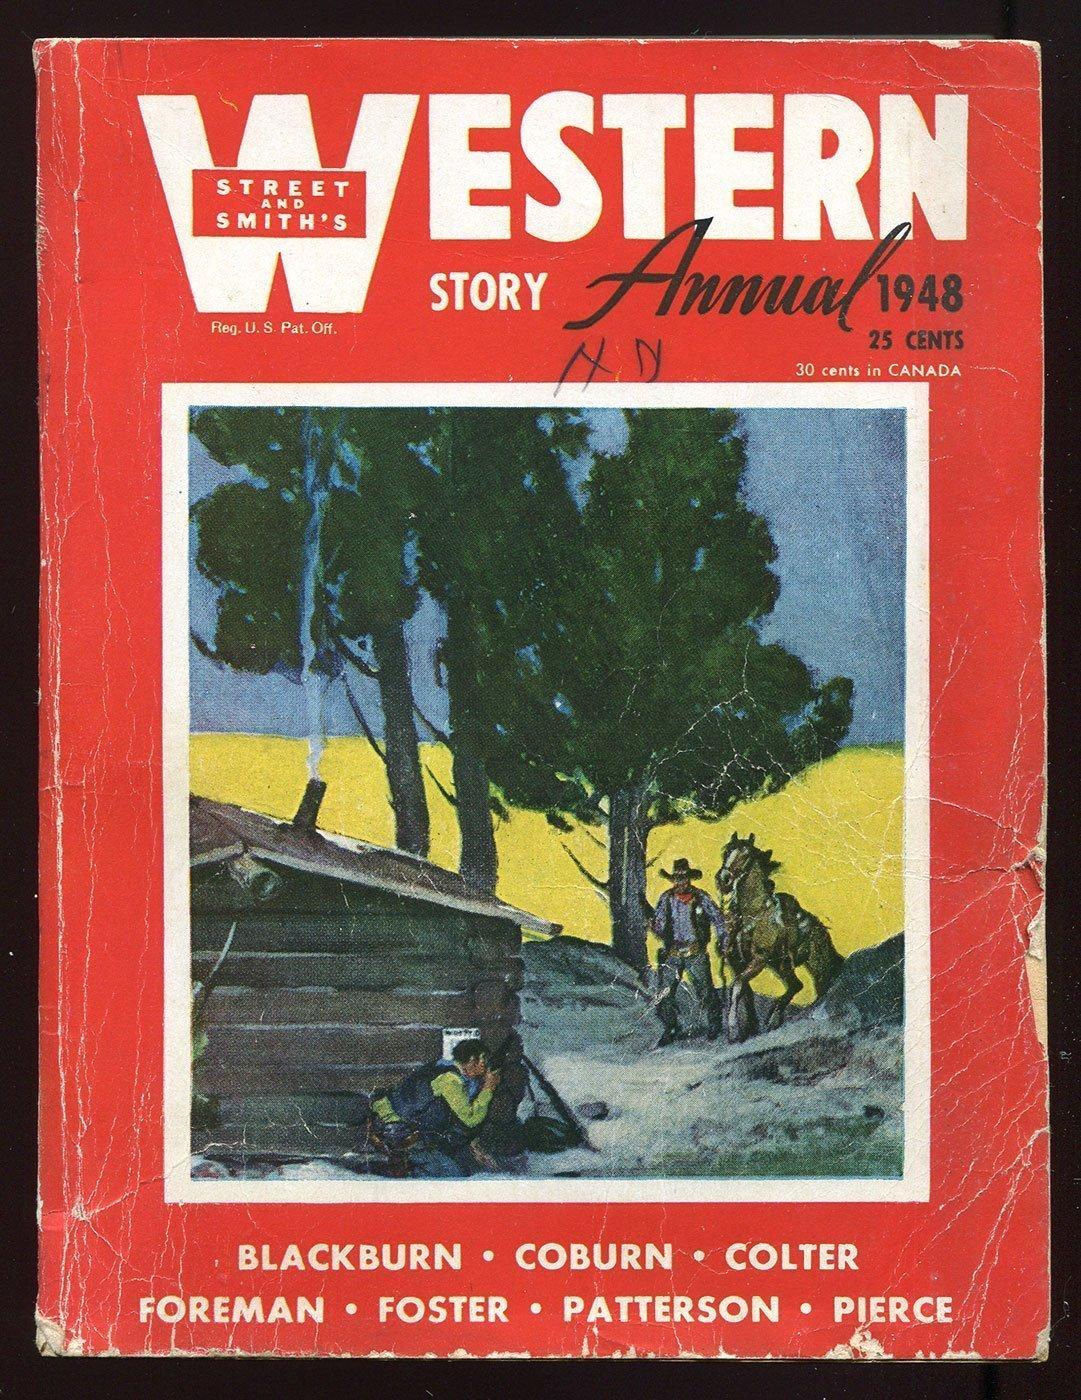 Western Story Magazine: 1948 Annual